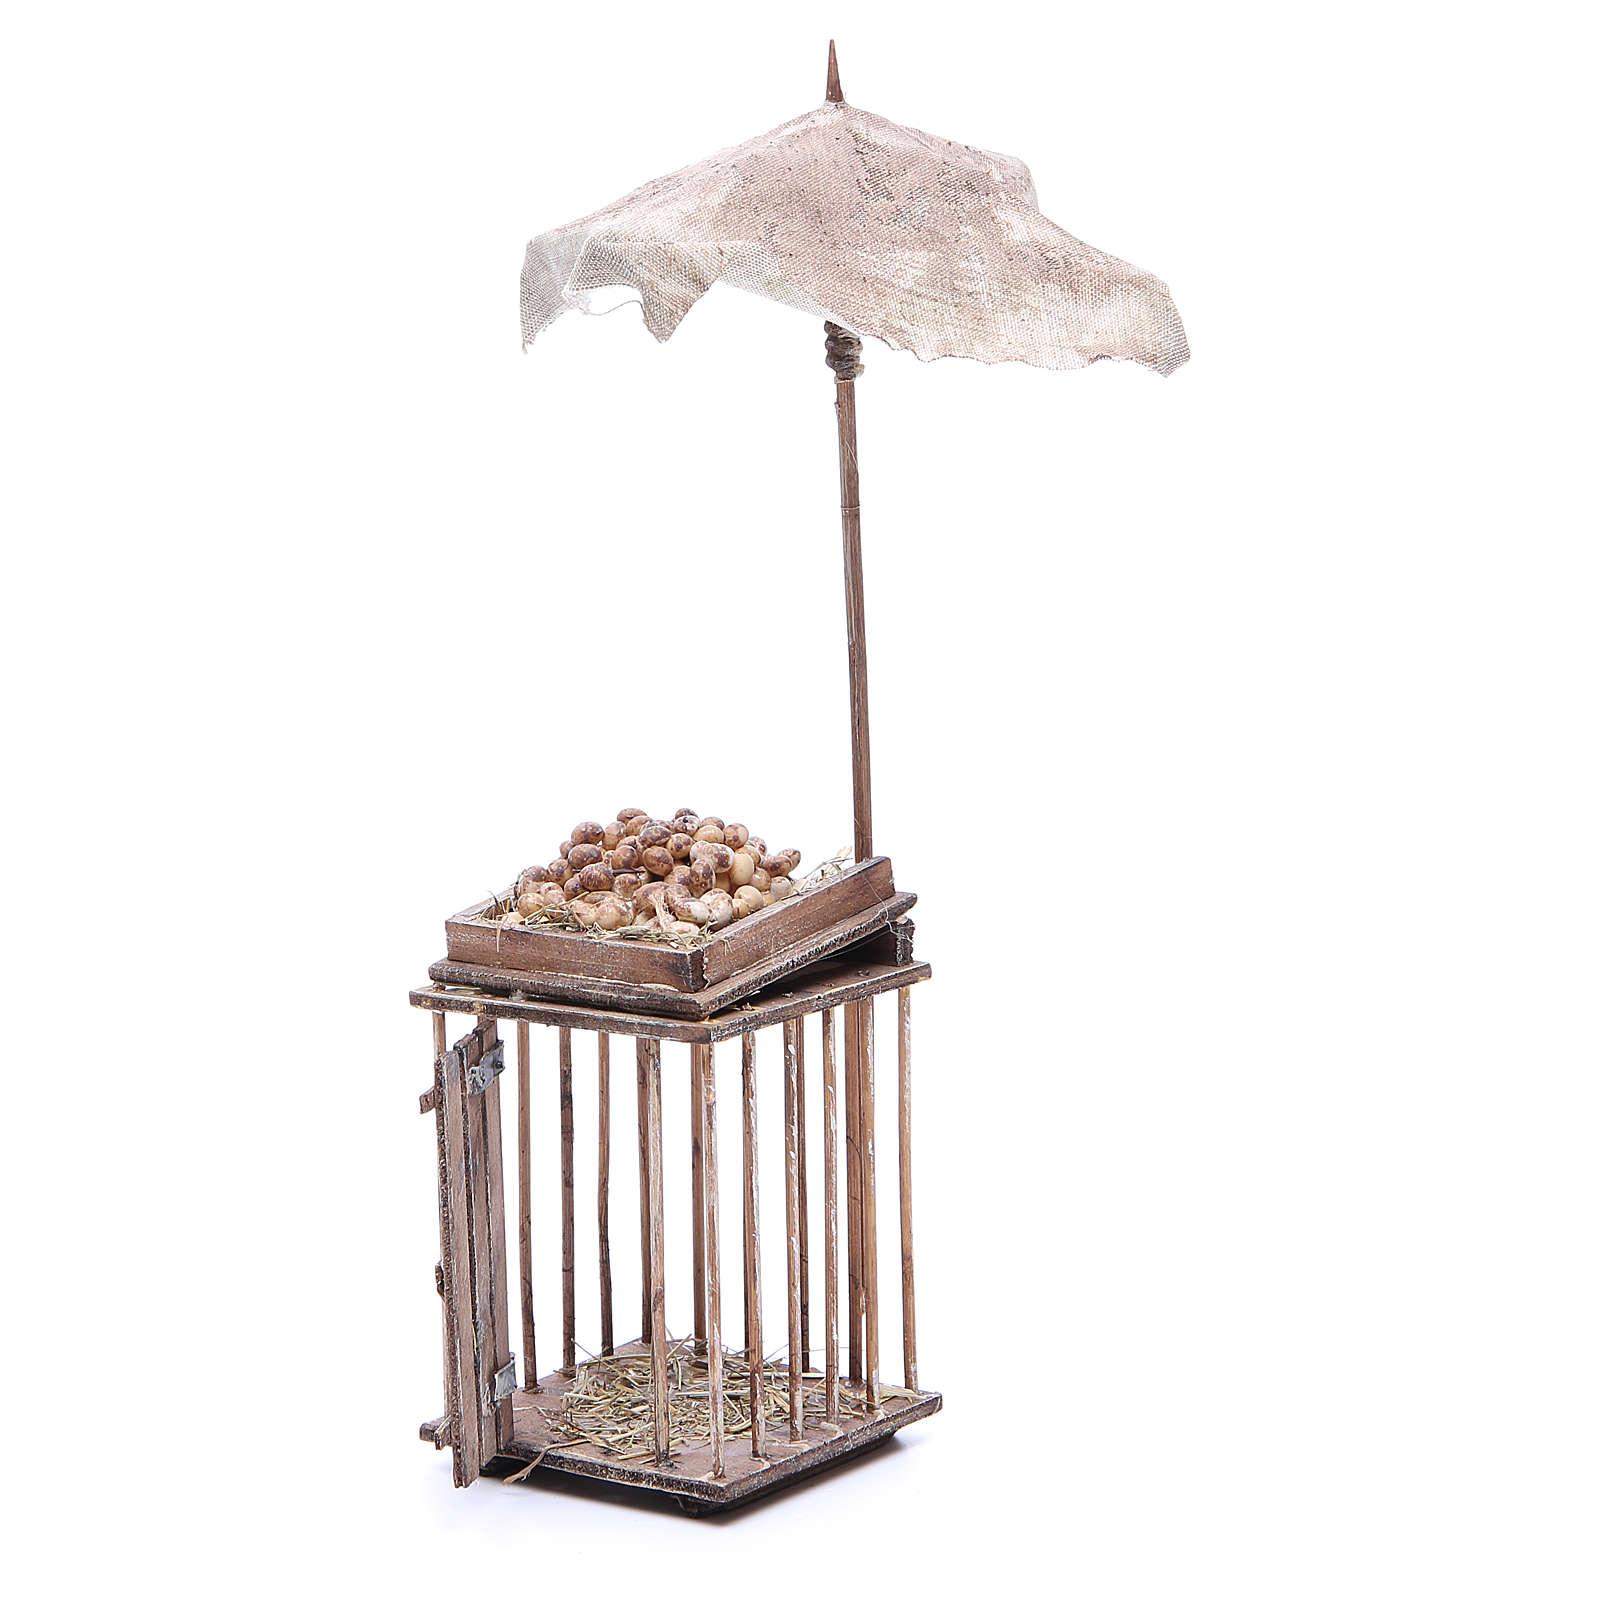 Ovaiola con ombrello 24 cm presepe napoletano 4